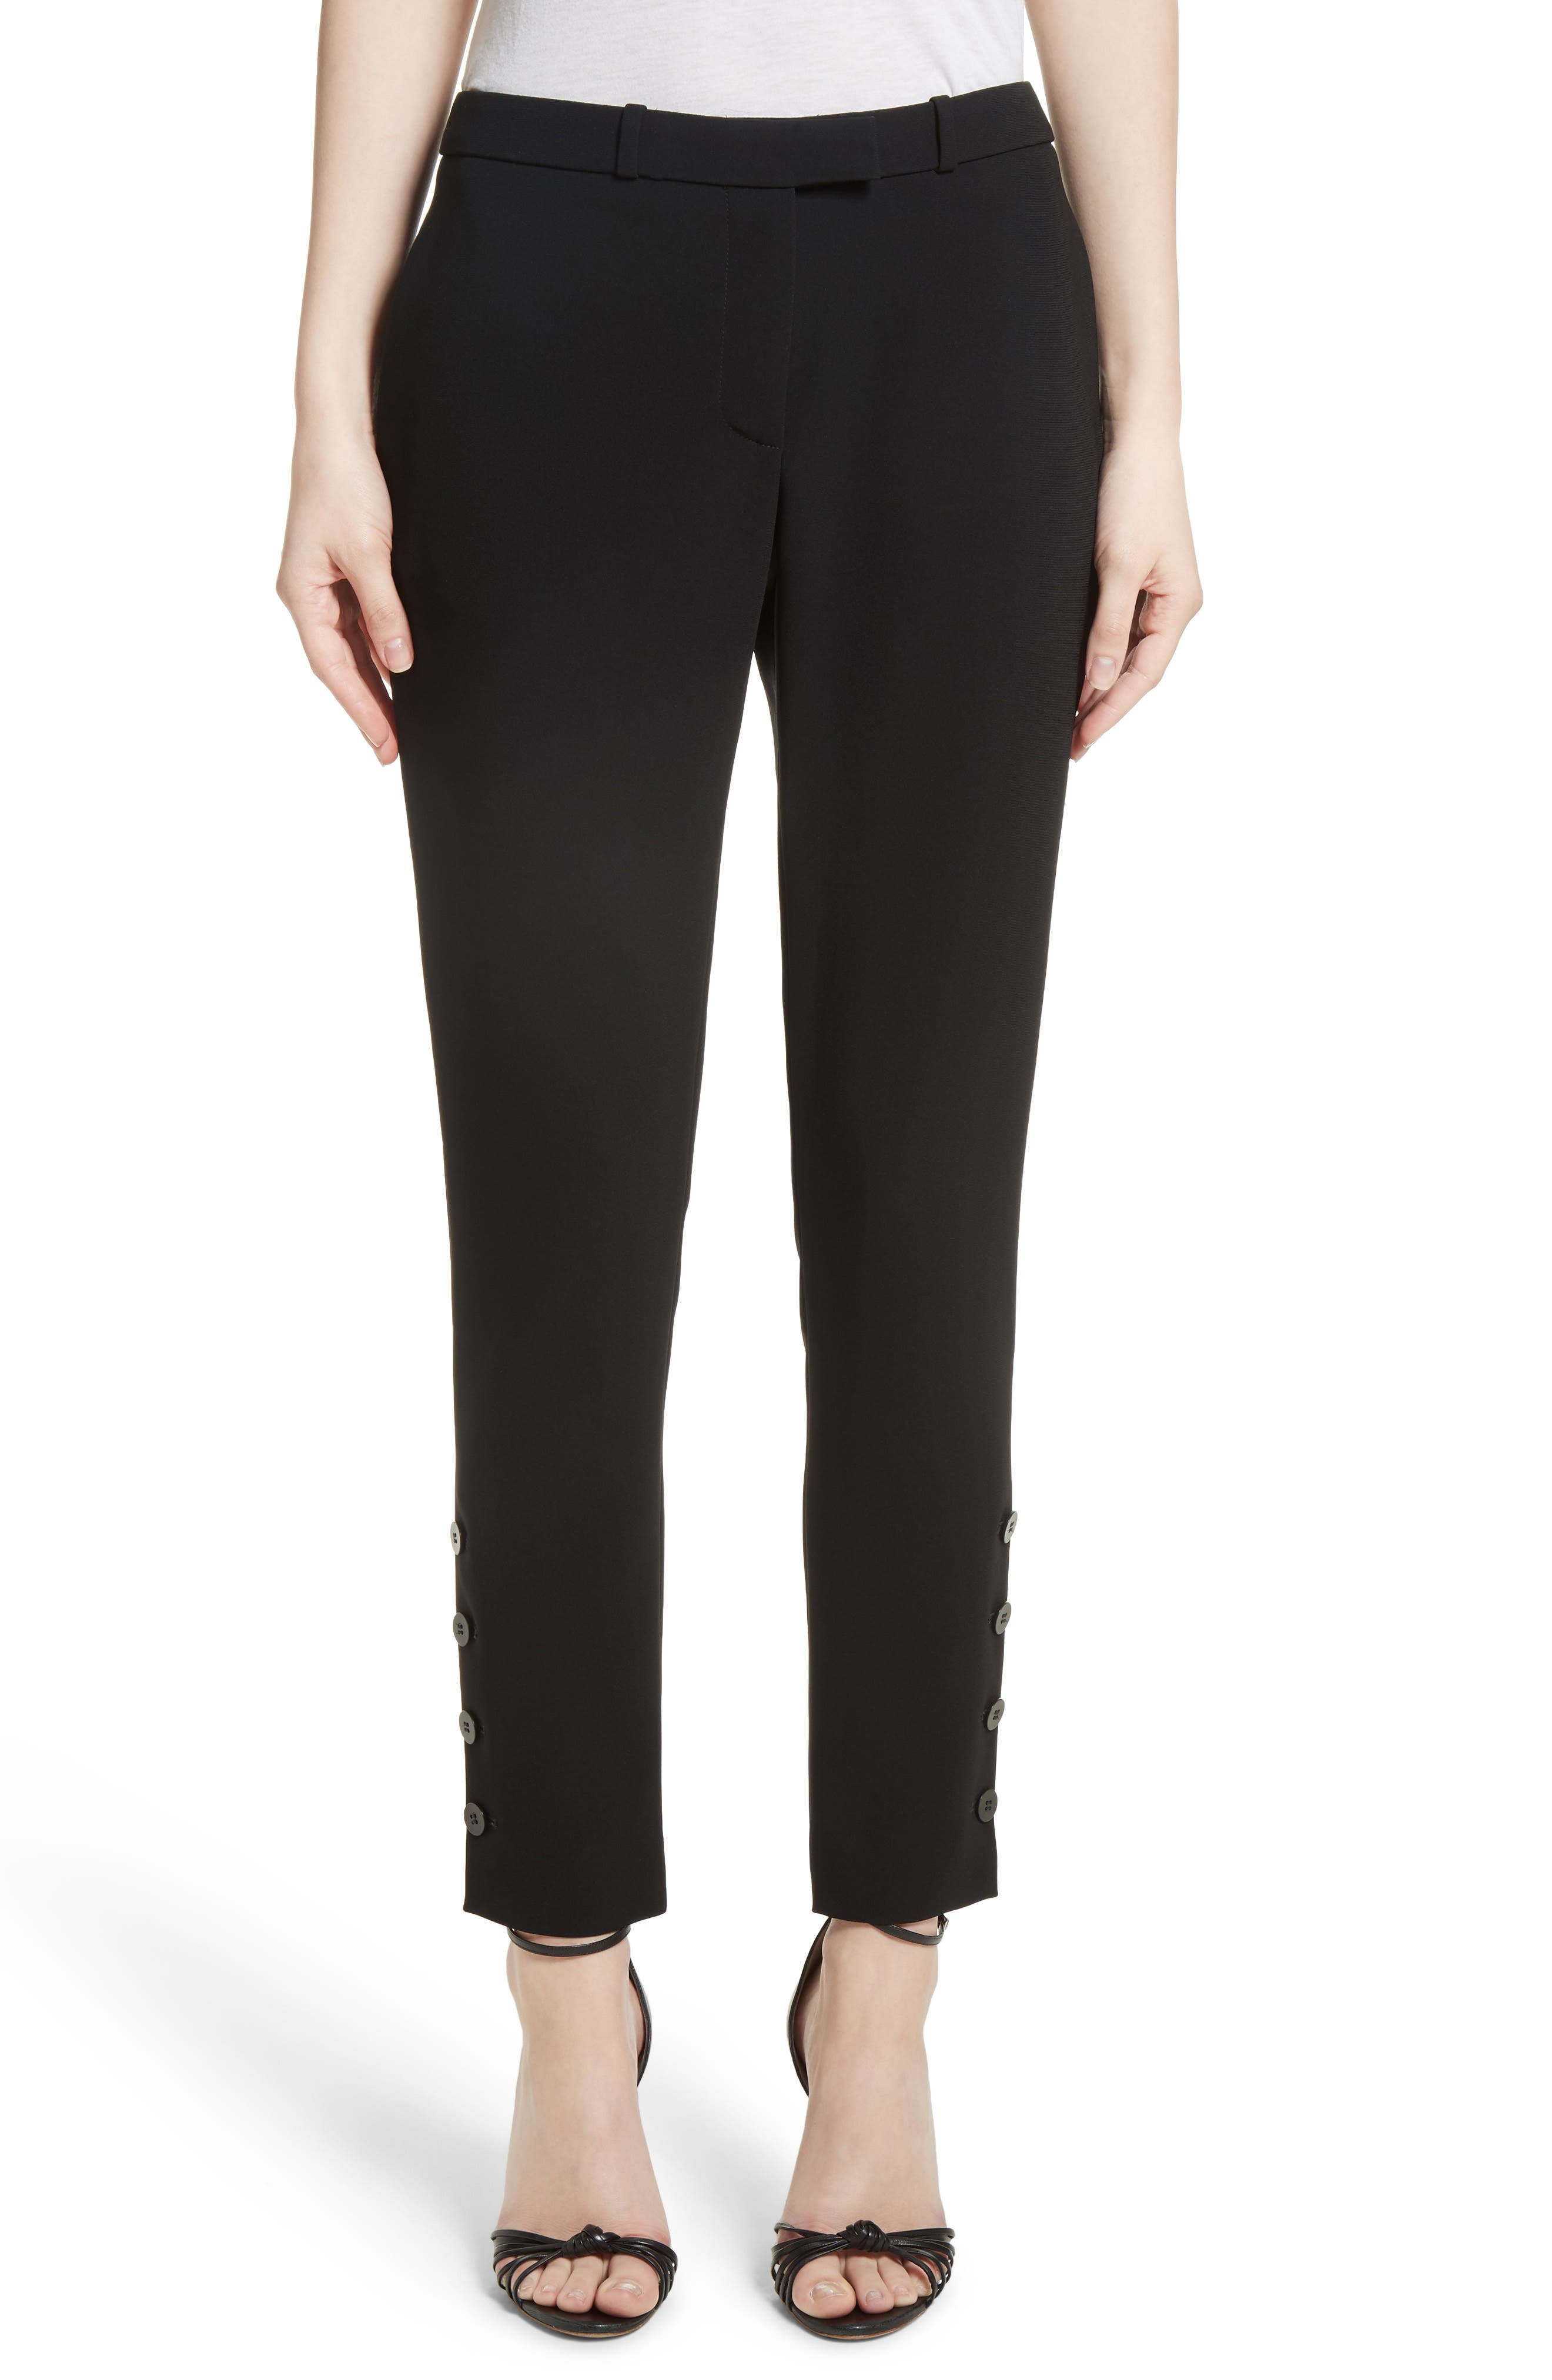 Altuzarra Tristan Button Detail Skinny Pants